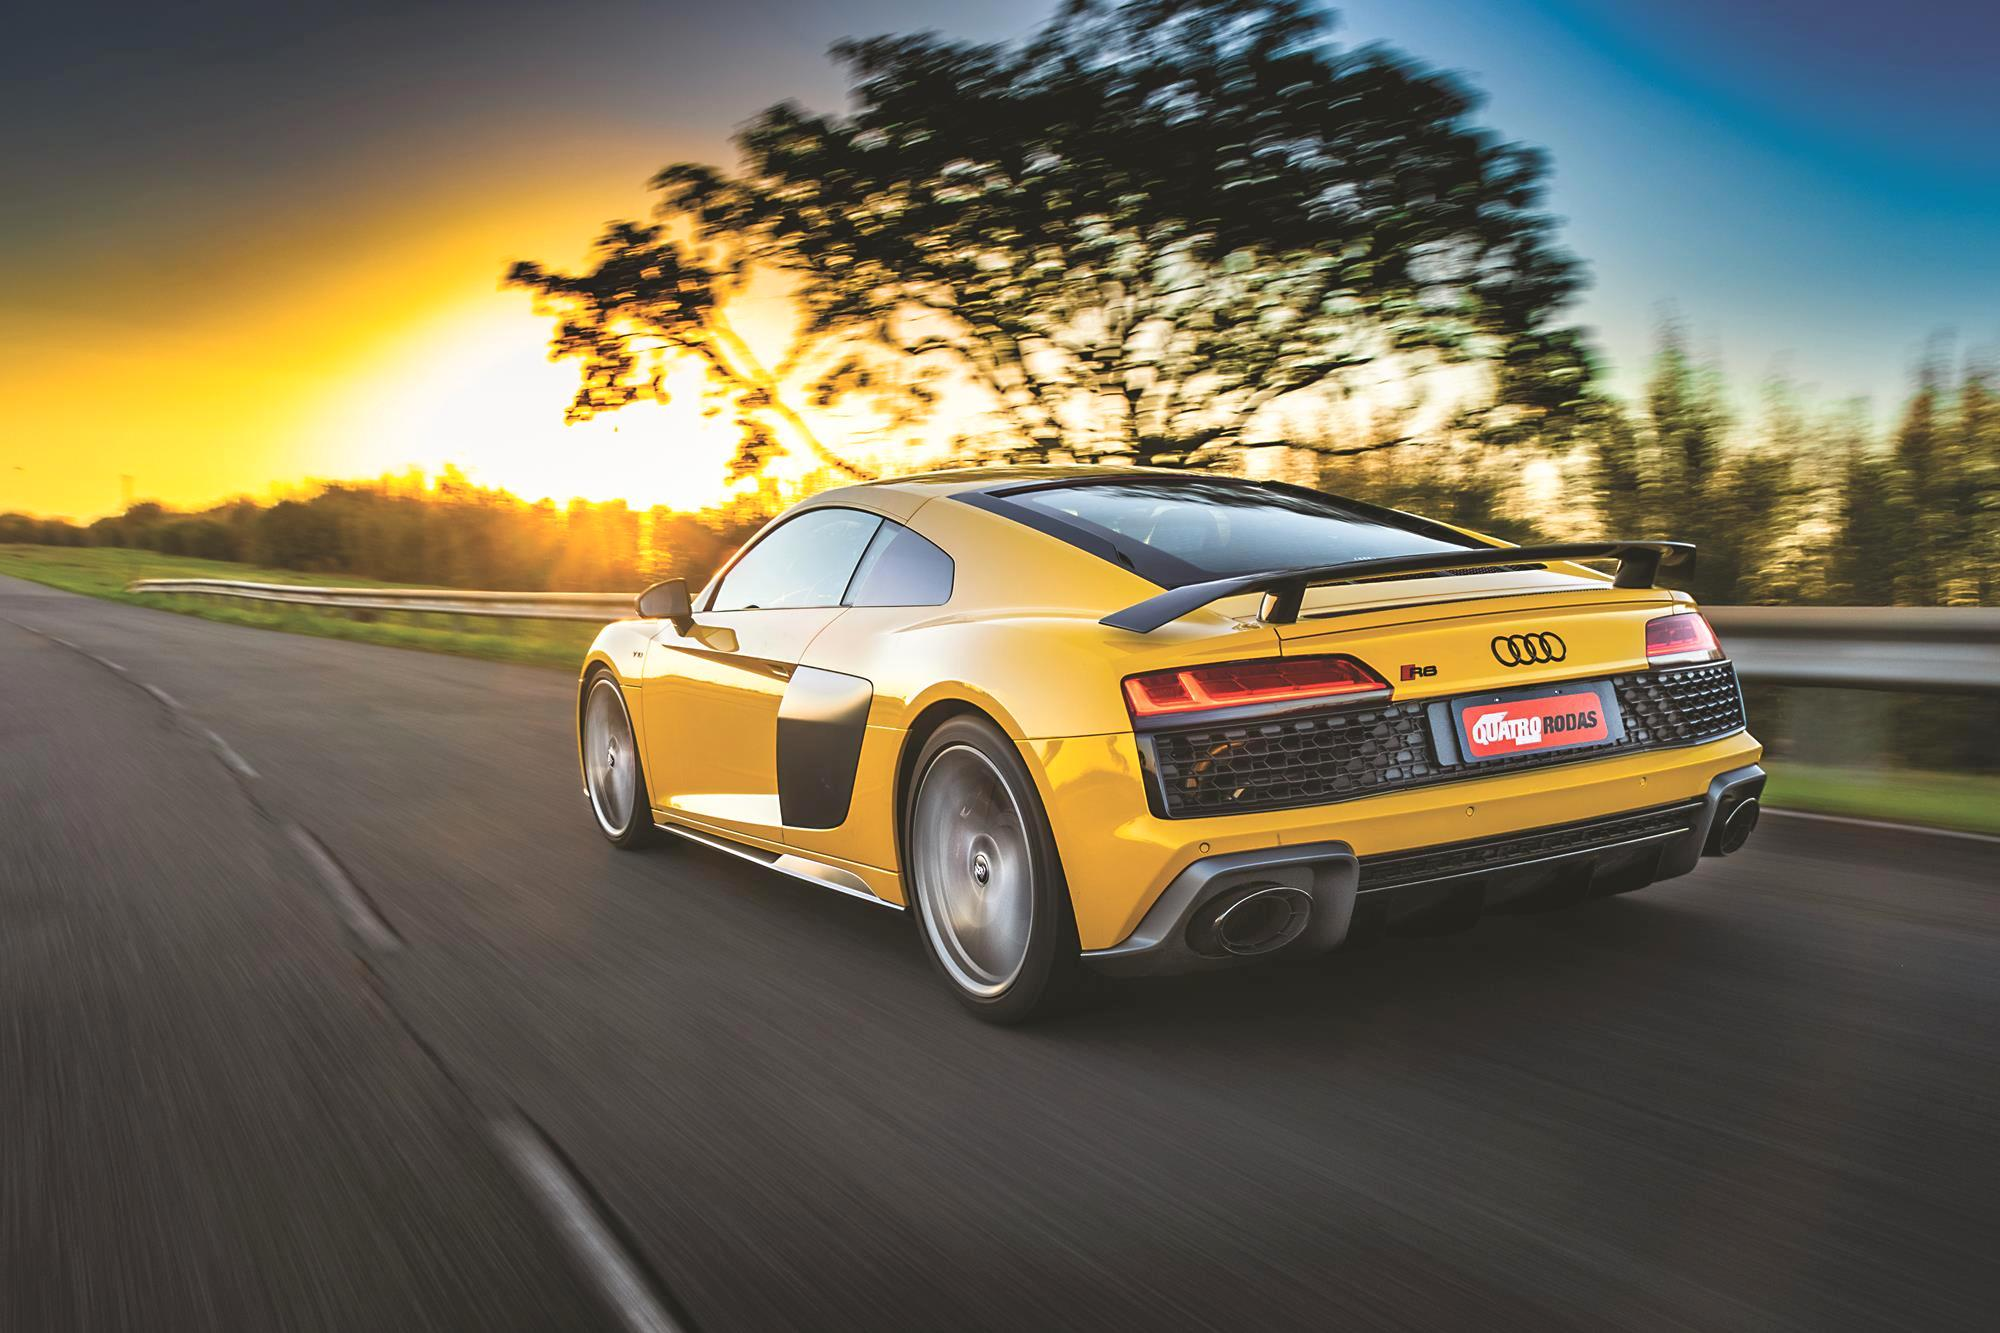 Audi R8 V10 Performance 2020 amarelo traseira